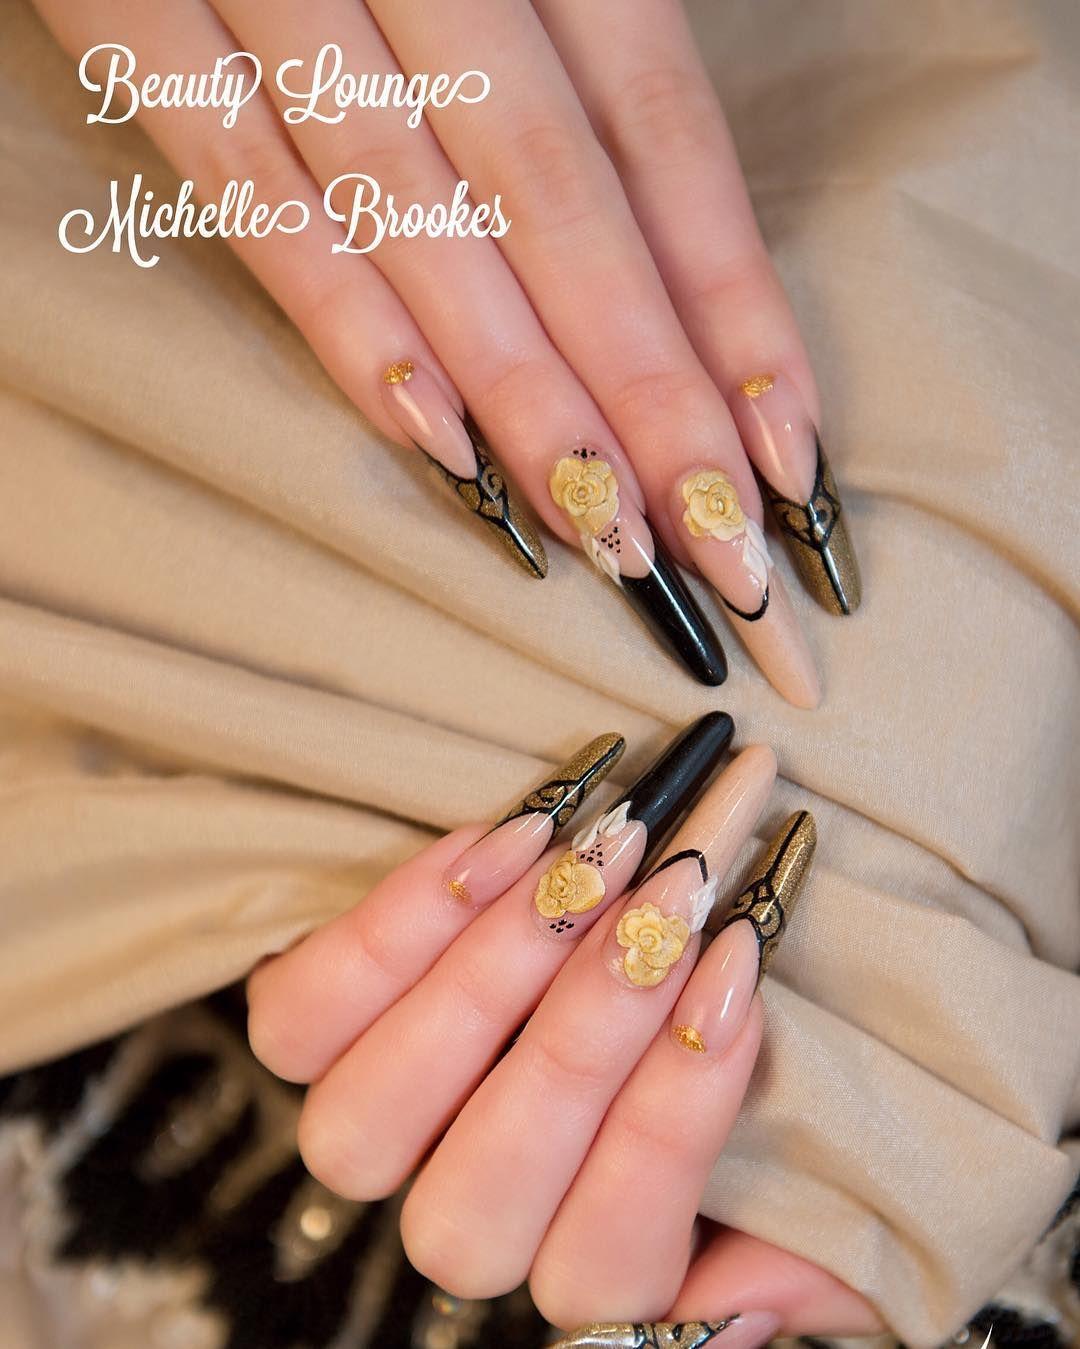 Beauty Lounge On Instagram Beautylounge Doncaster Showscratch Scratchmagazine Scra2ch Gel Acrylic Nailart Tech Instan Beauty Lounge Beauty Nail Art